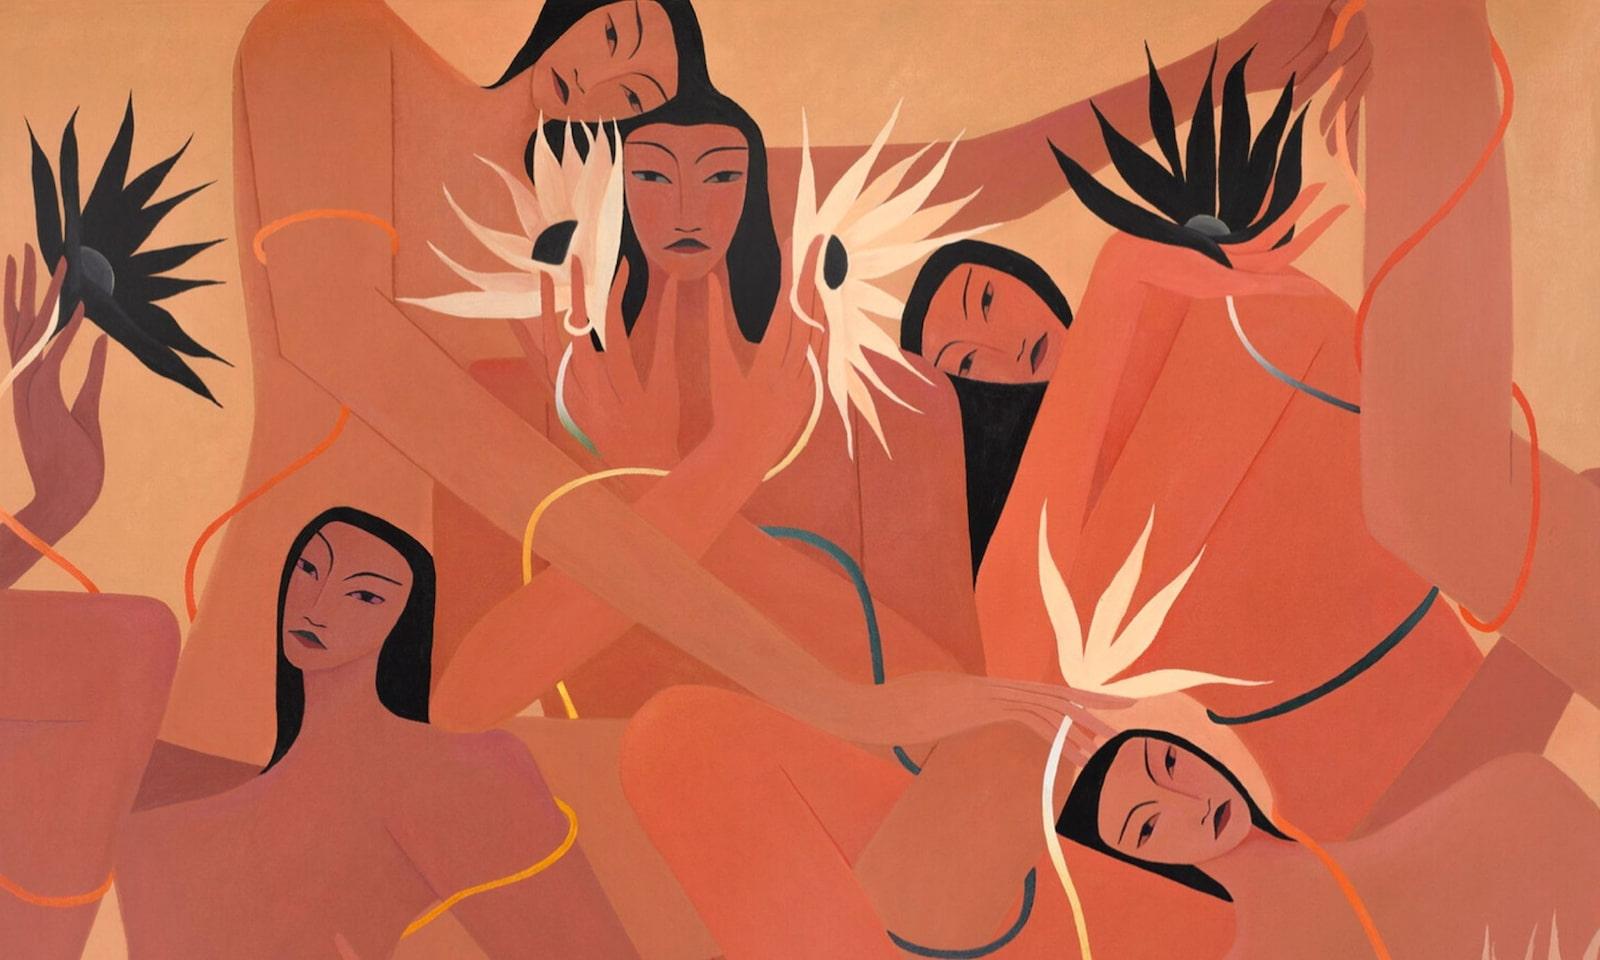 Celebrating Women's Bodies: Discover Laura Berger Dreamlike Paintings